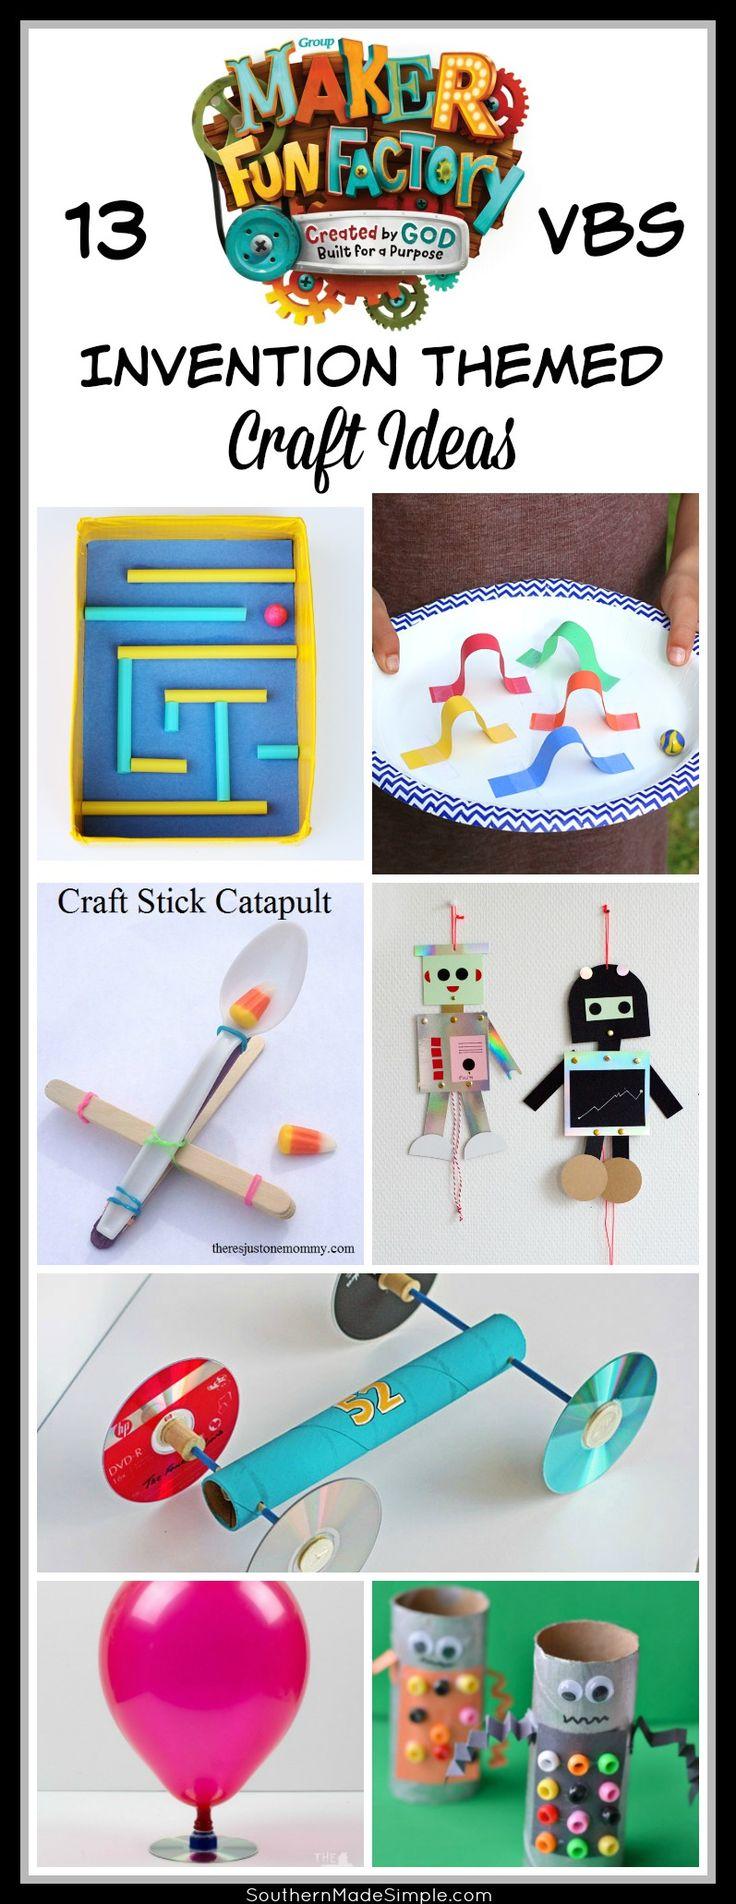 Vacation bible school crafts ideas - Maker Fun Factory Vbs Craft Ideas